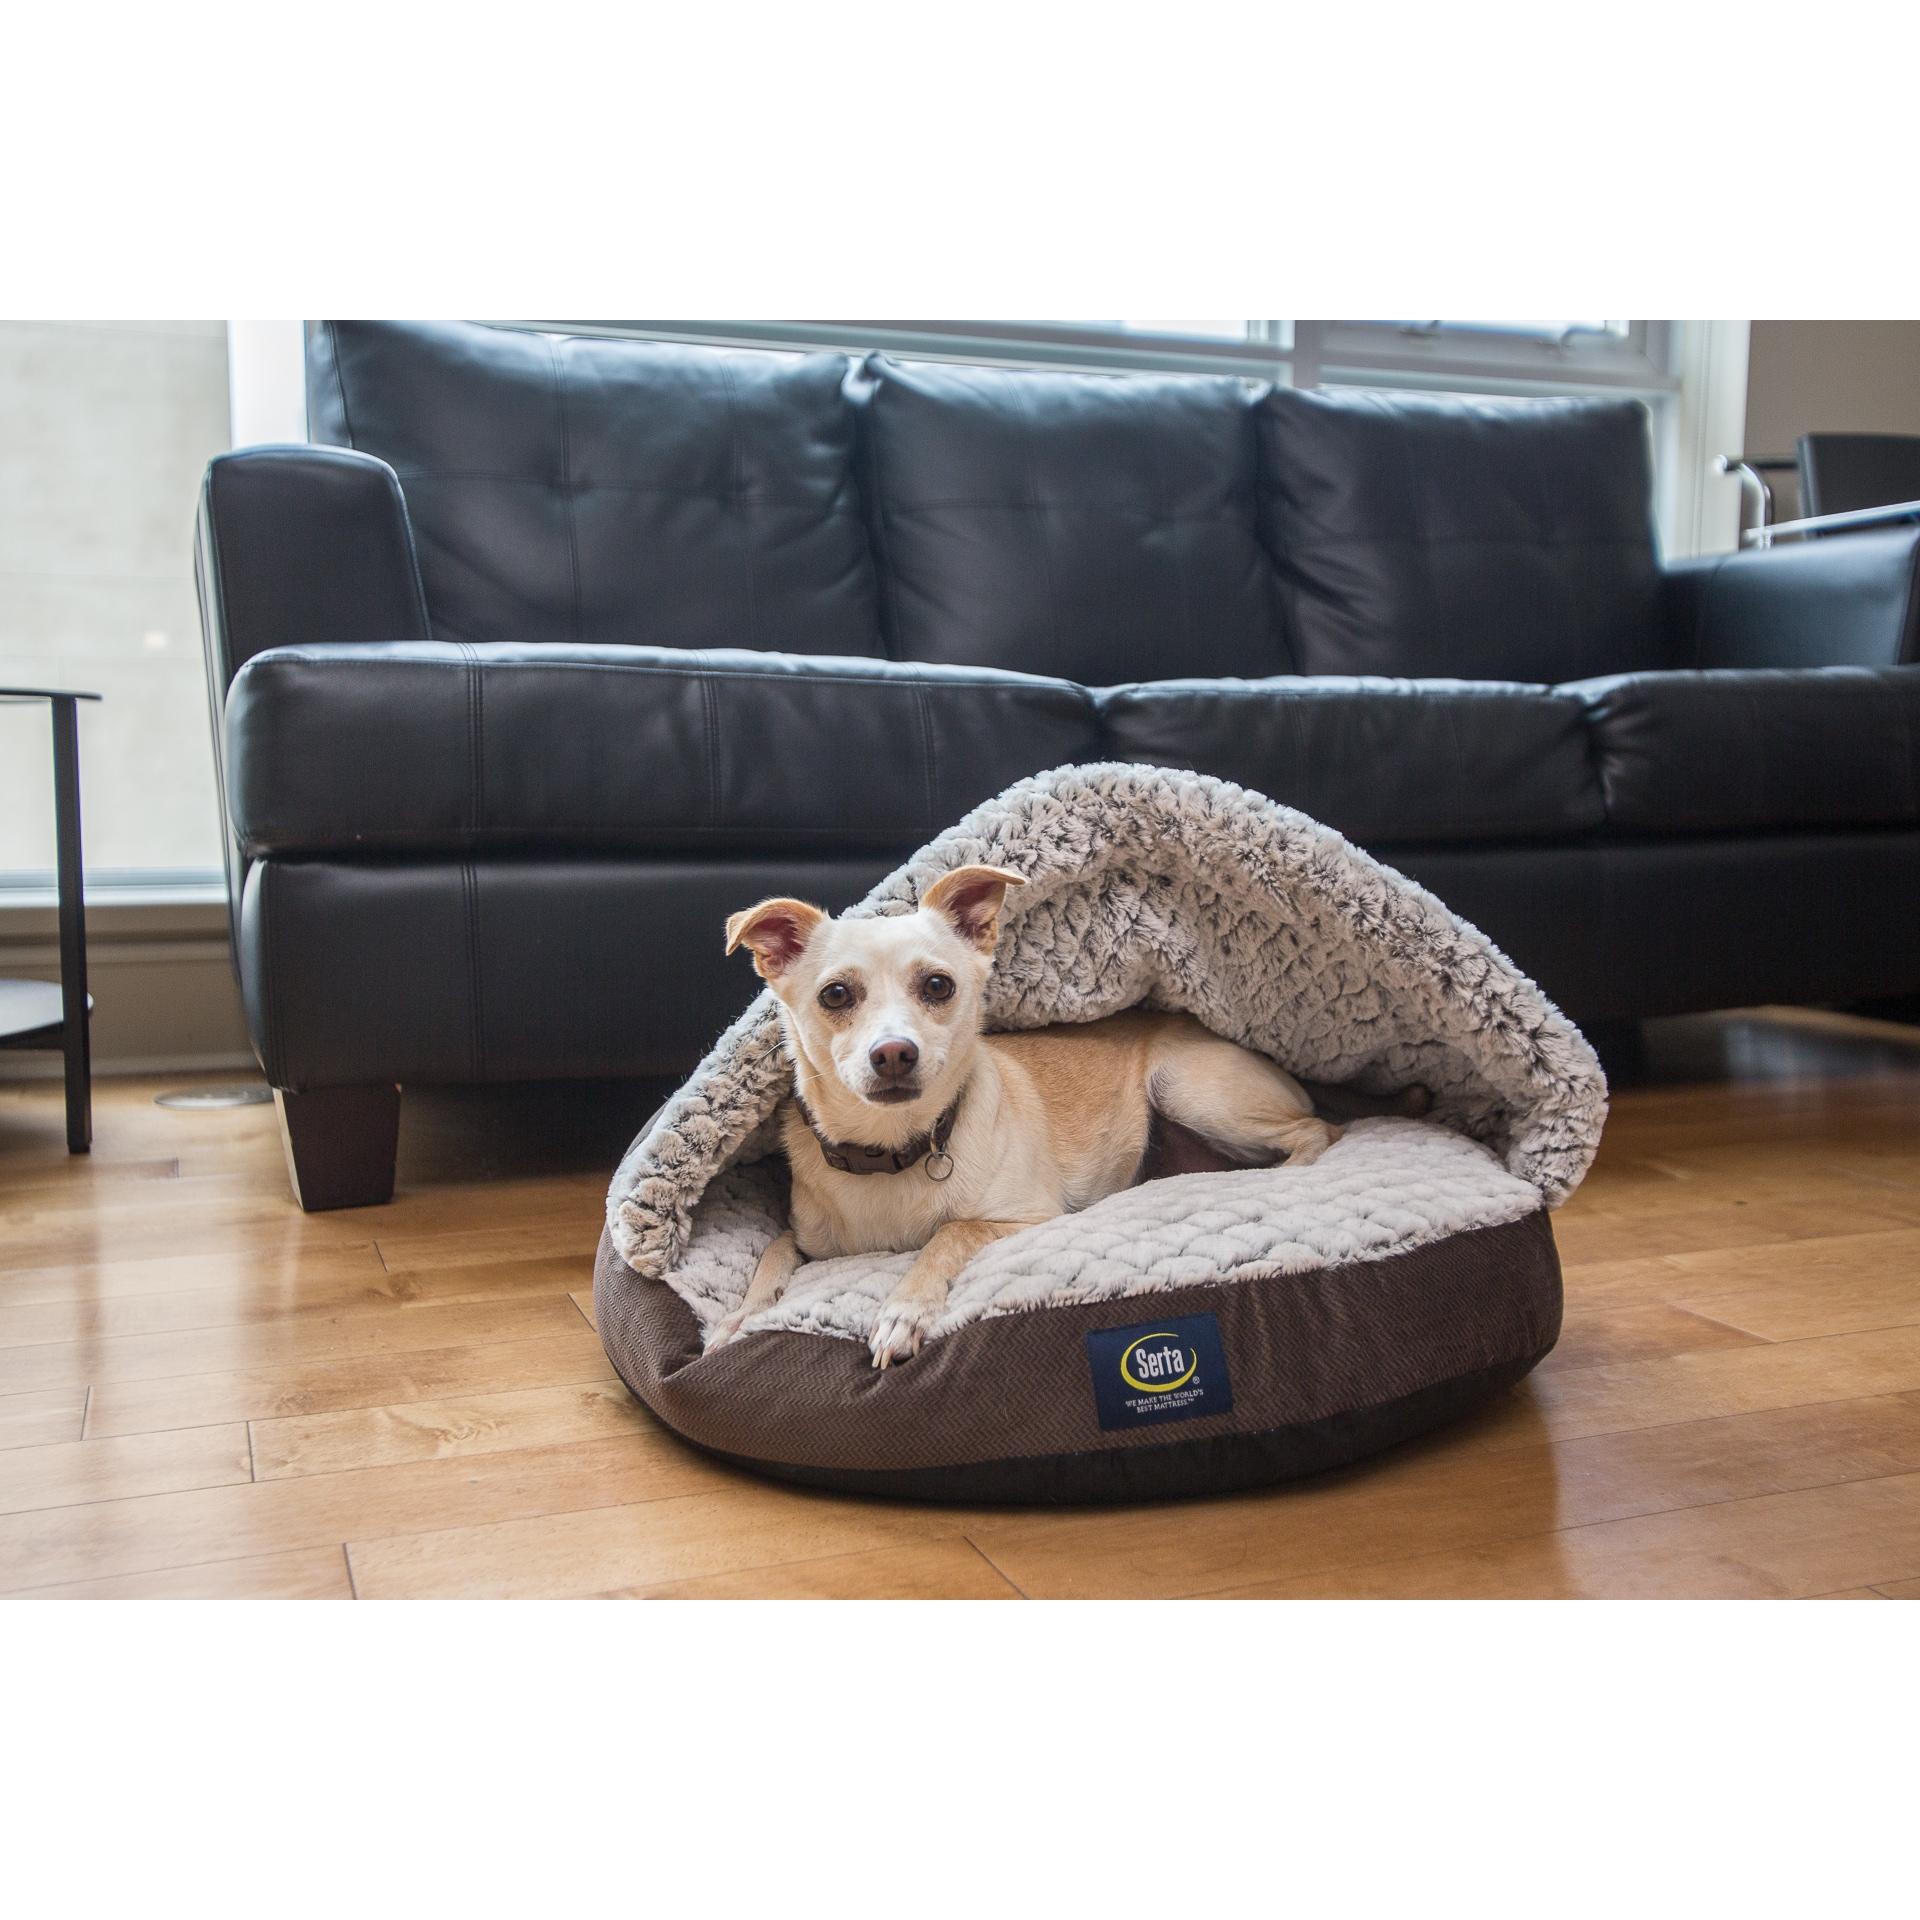 Serta Pet Bed Snuggle Sherpa Nest (As Is Item) (Serta Nes...